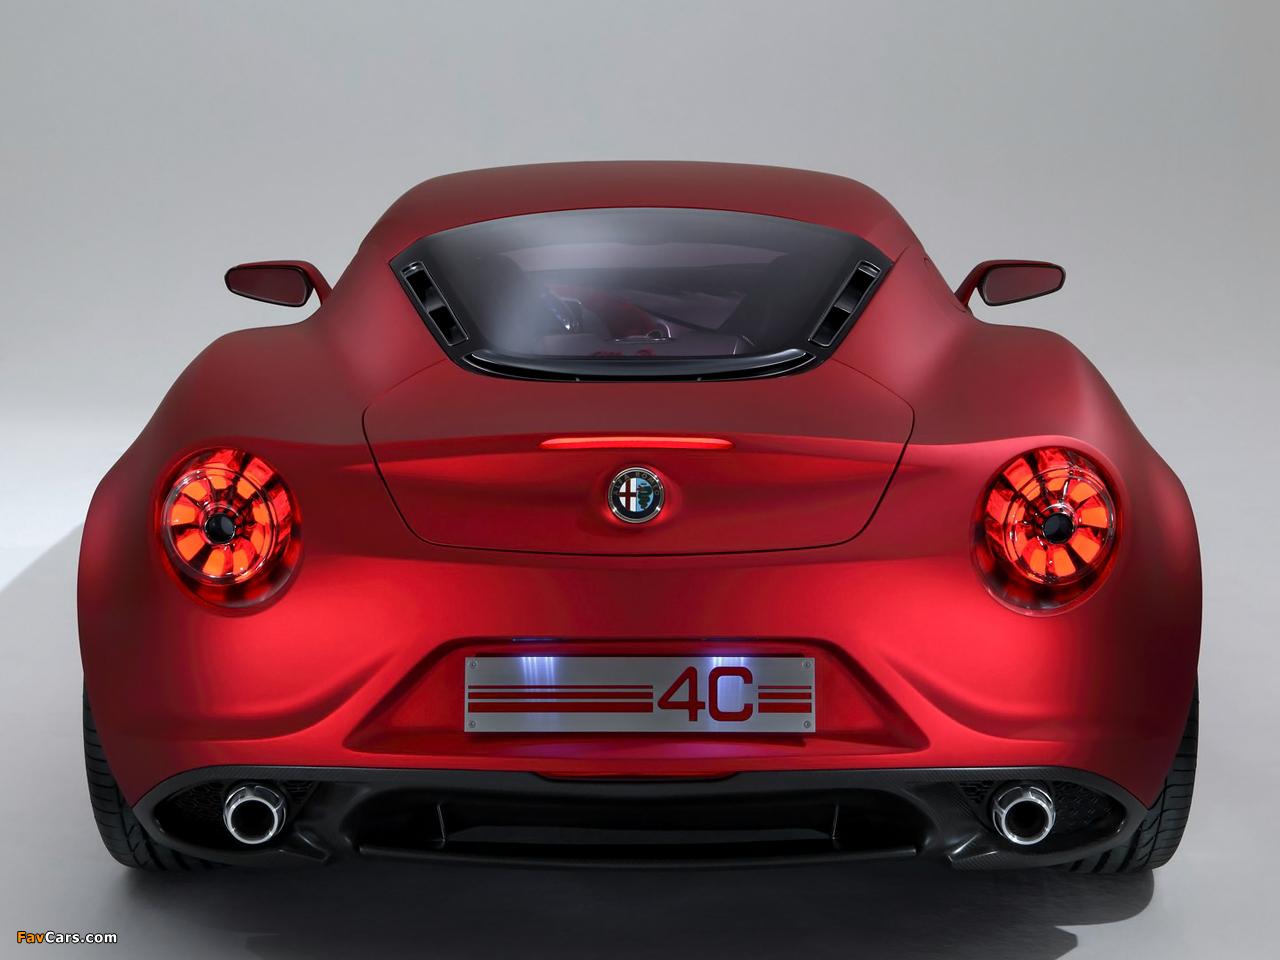 Alfa Romeo 4C Concept 970 (2011) photos (1280 x 960)